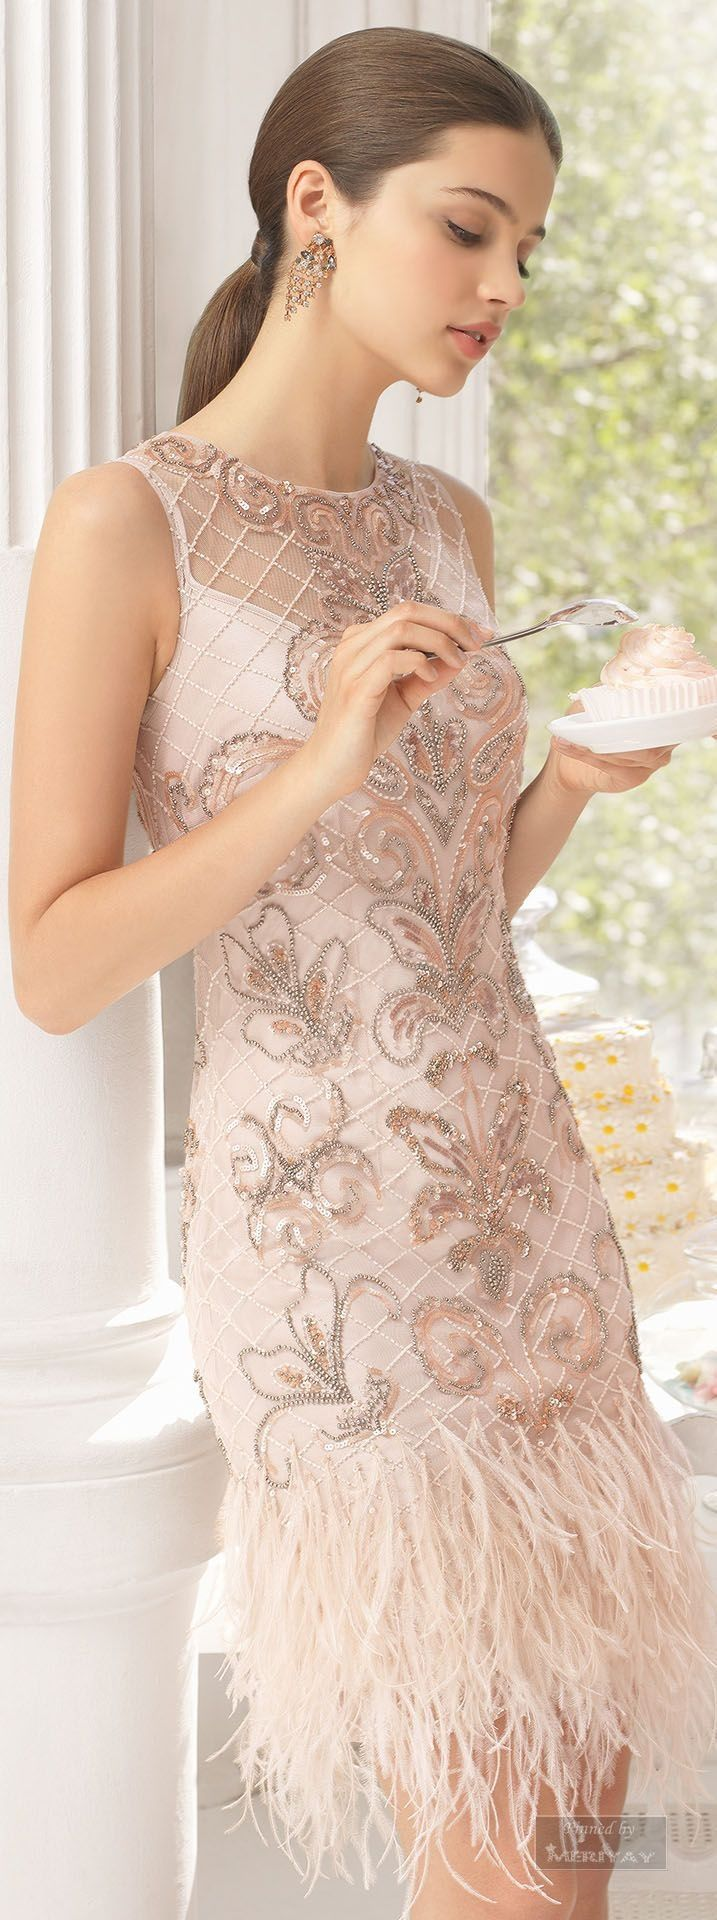 319 best la petite robe rose images on Pinterest | Feminine fashion ...